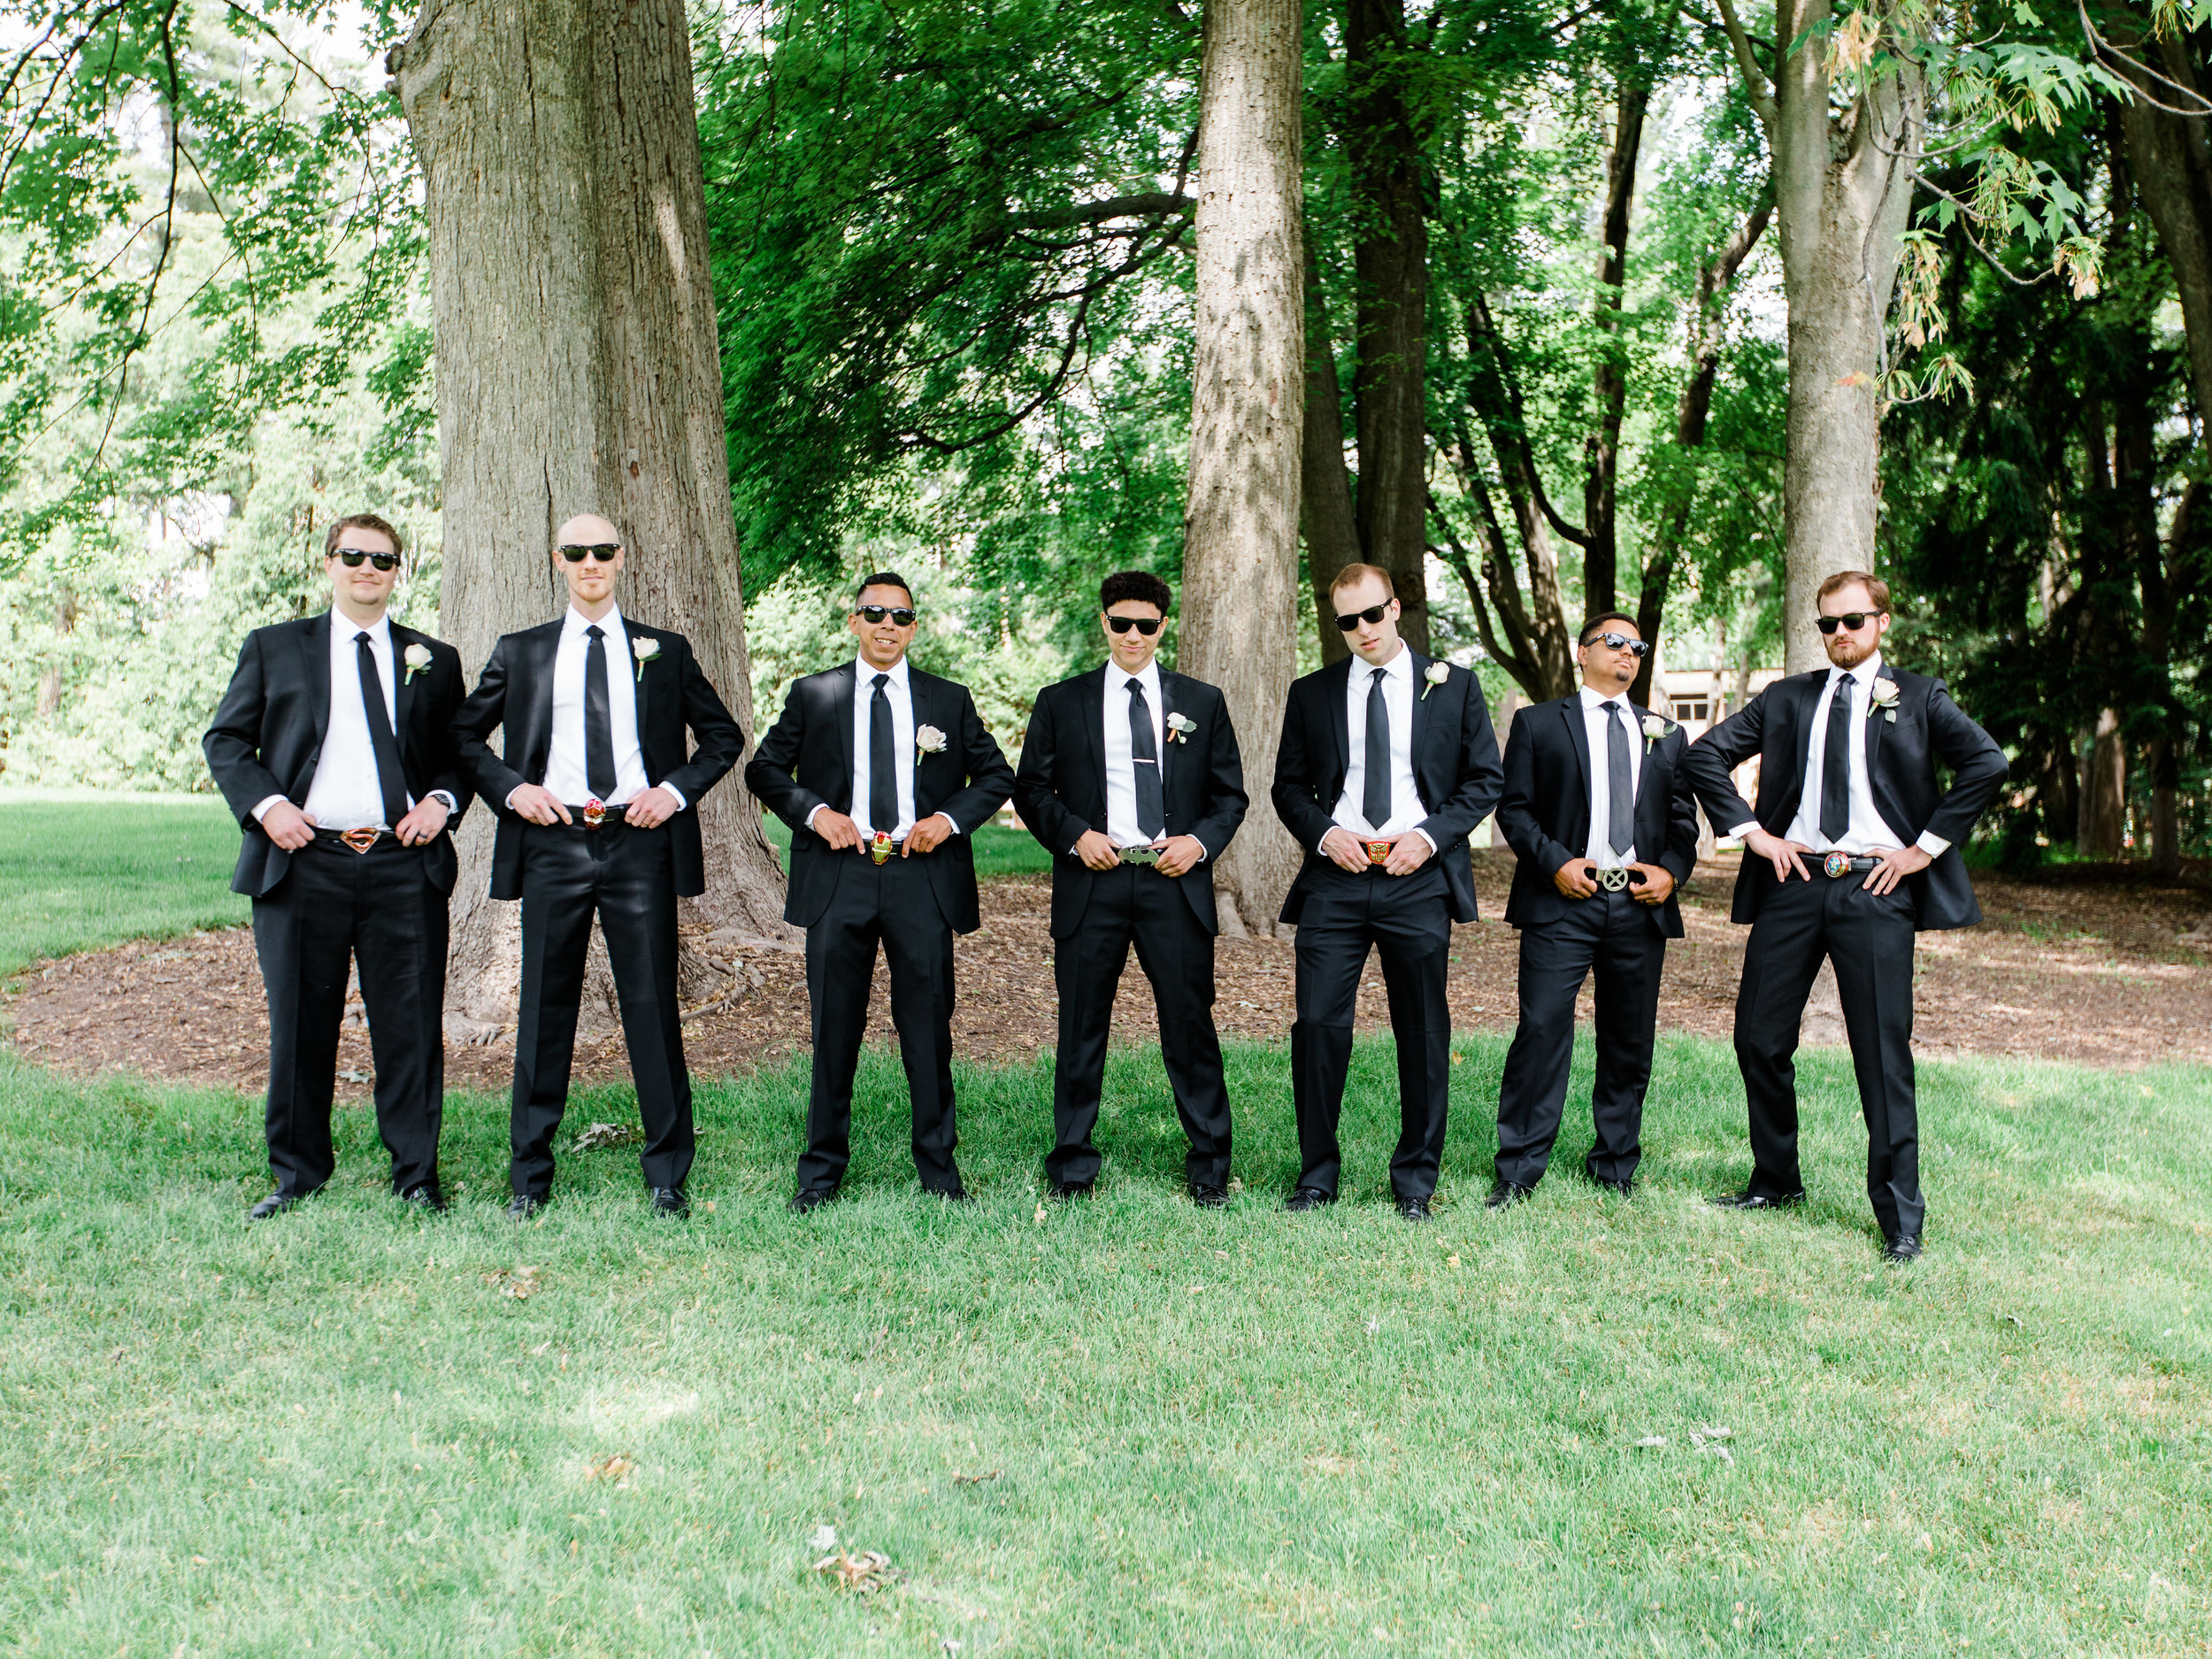 Julius+Wedding+BridalParty+Groomsmen-30.jpg